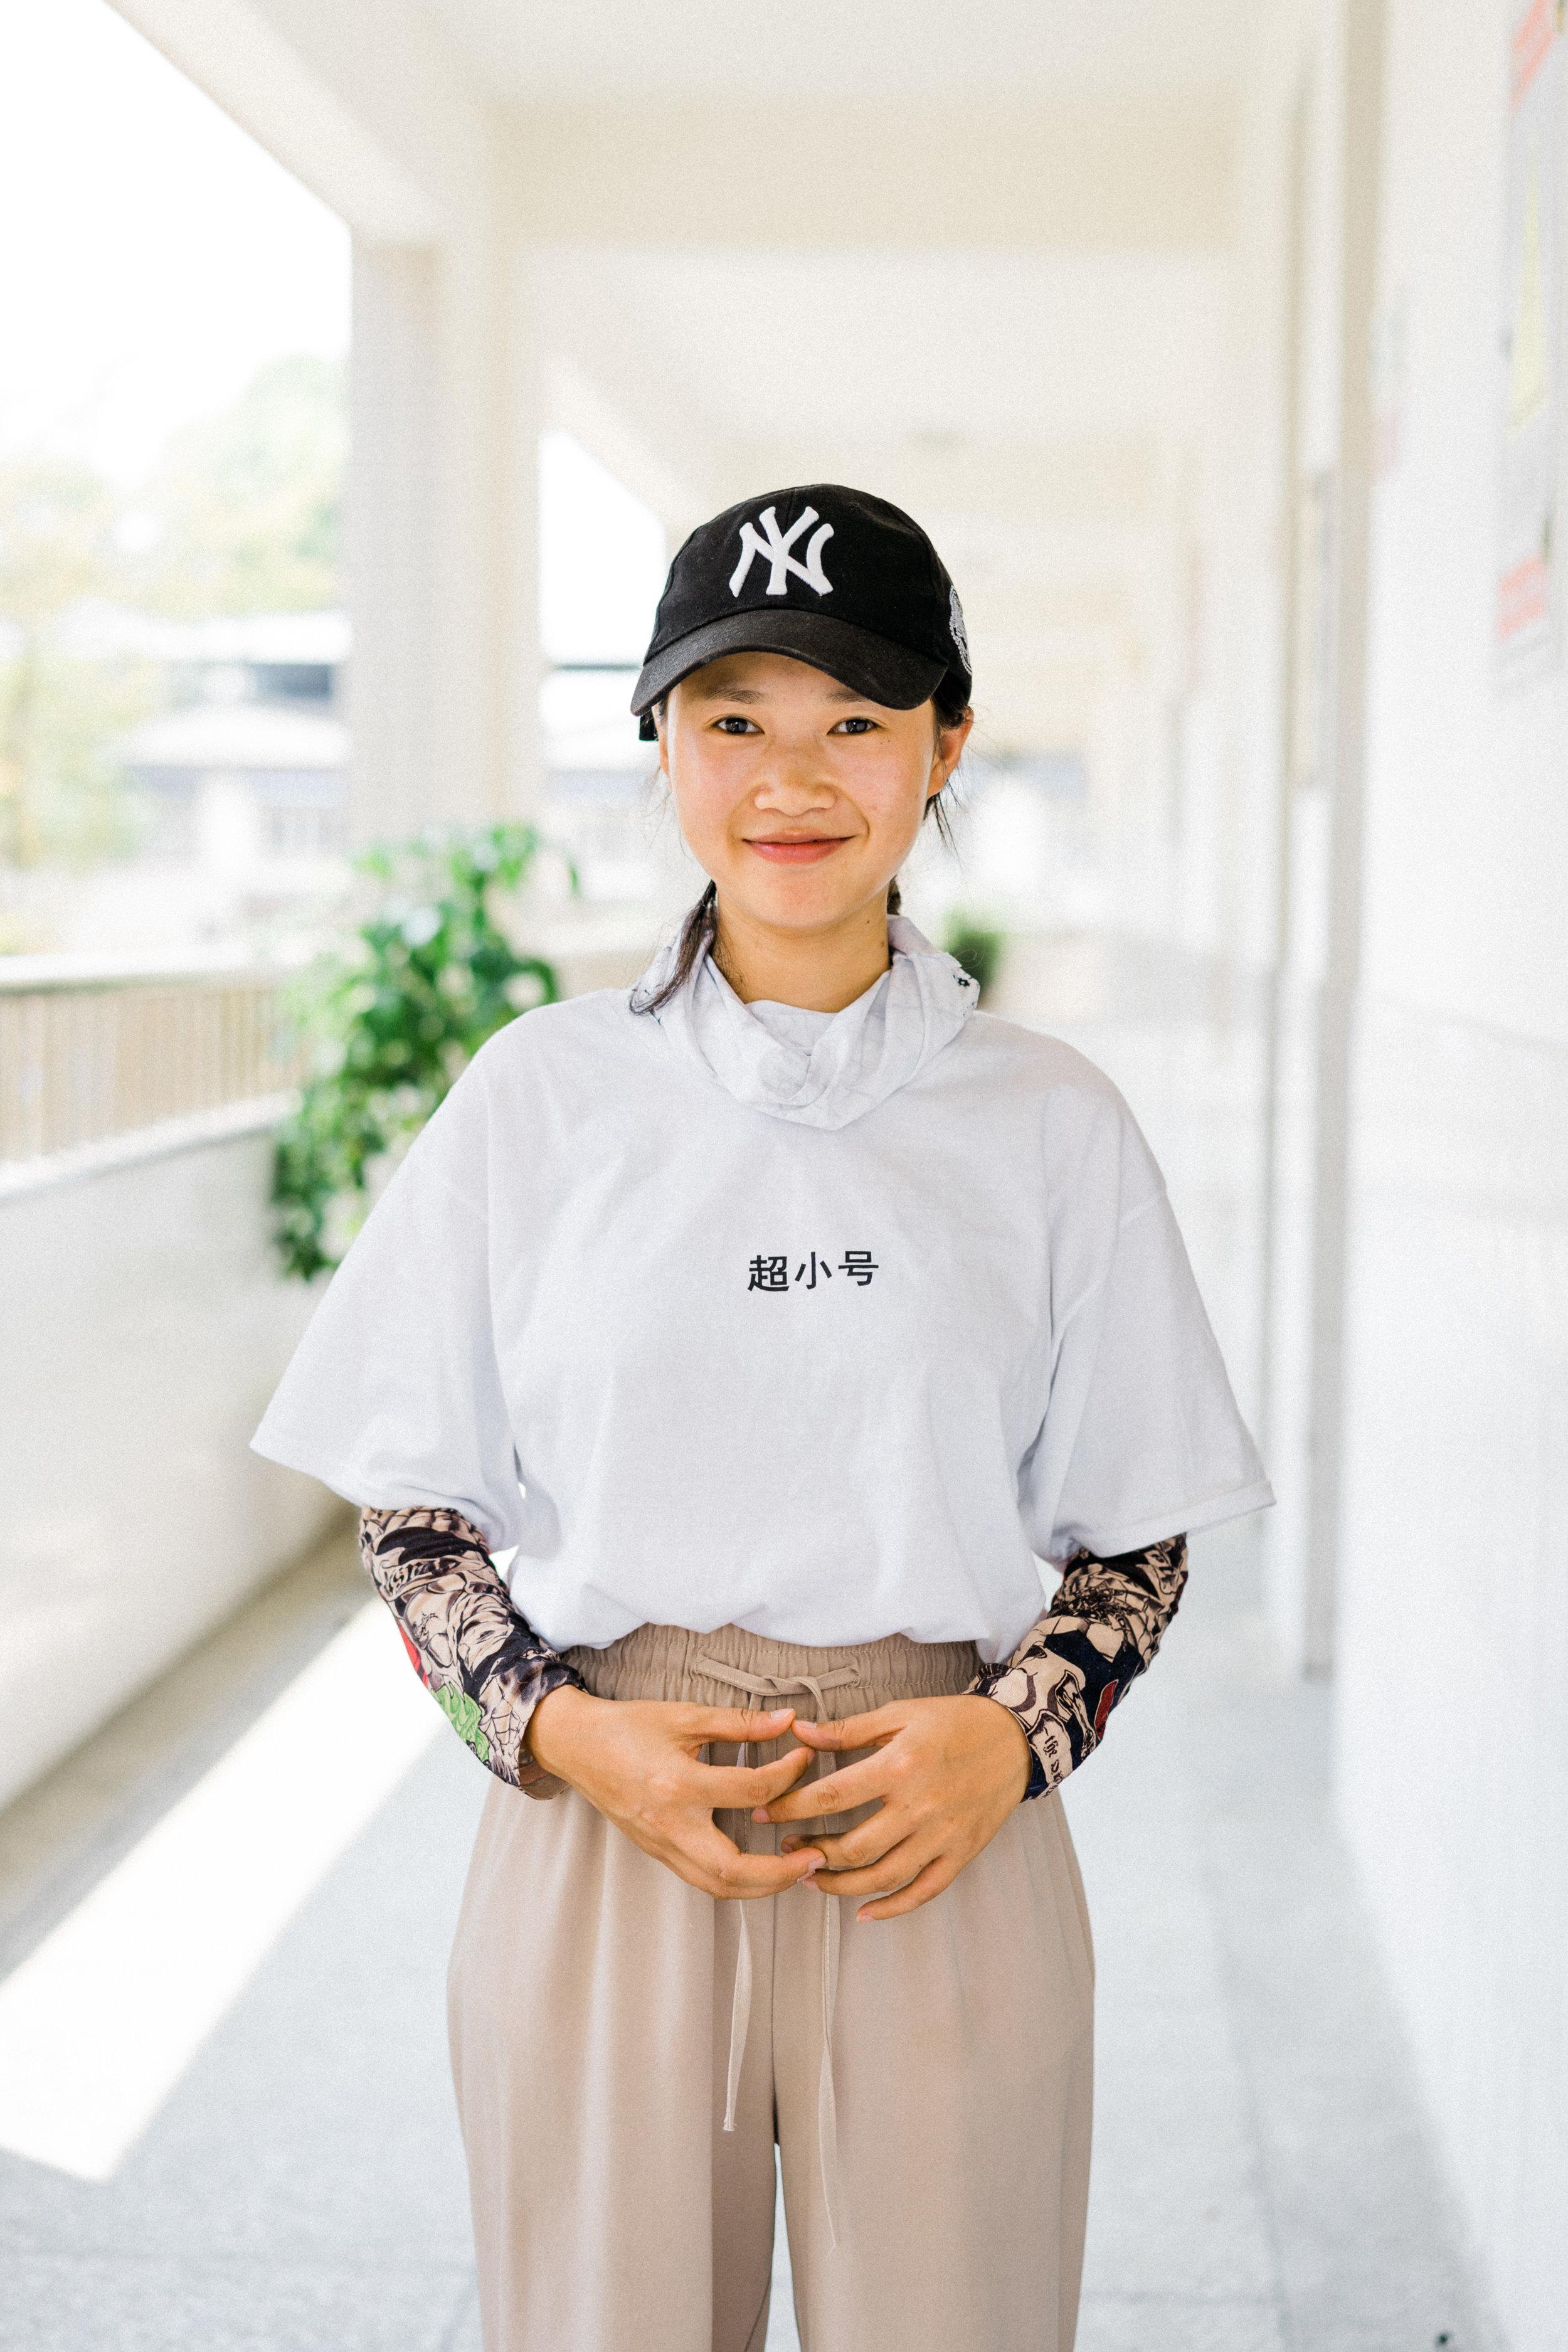 HMU Assistant 张慧玲-2.jpg